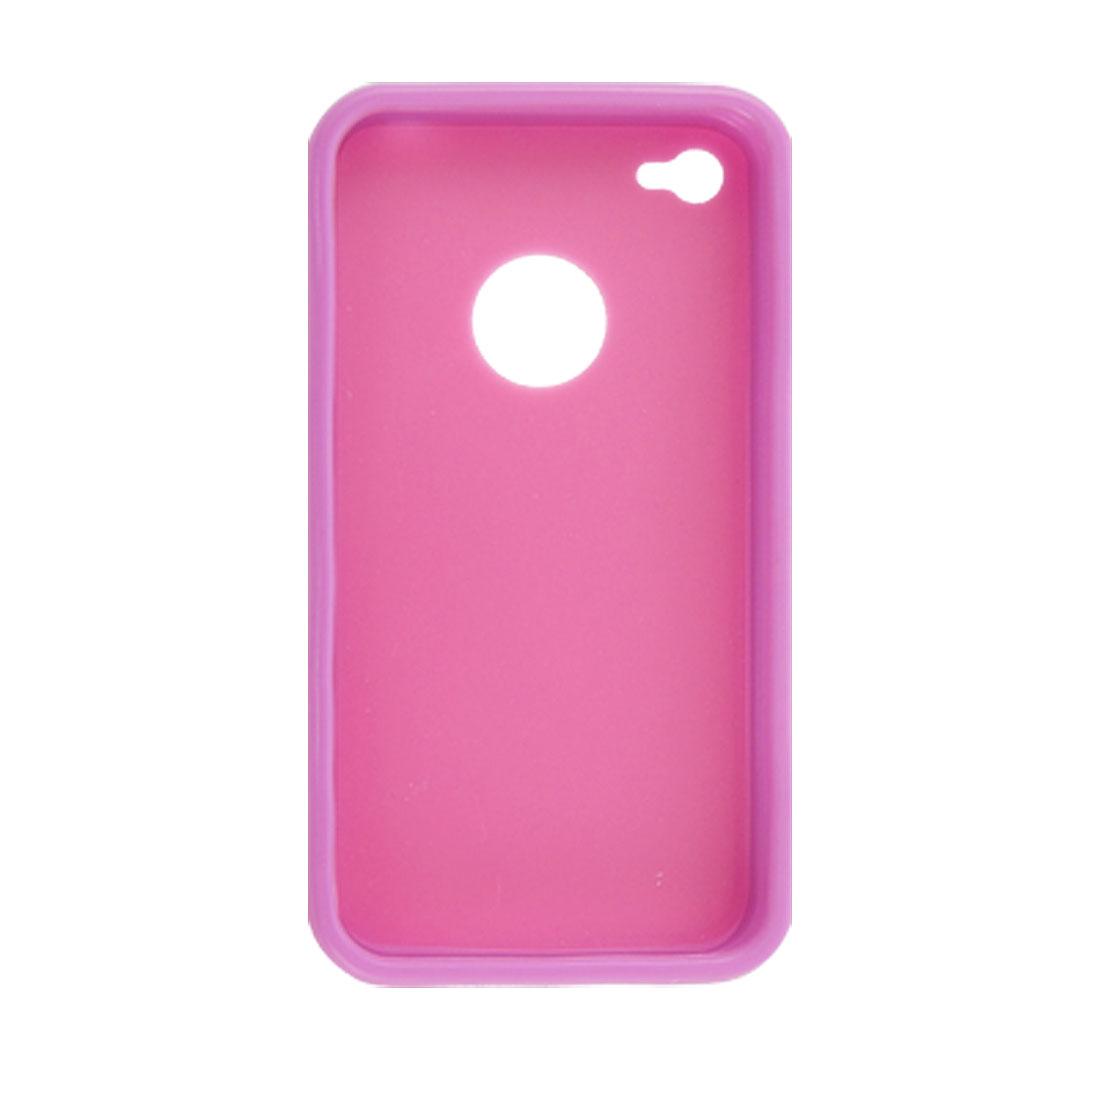 Fuchsia Back Purple Side Hard Plastic Hole Design Case for iPhone 4 4G